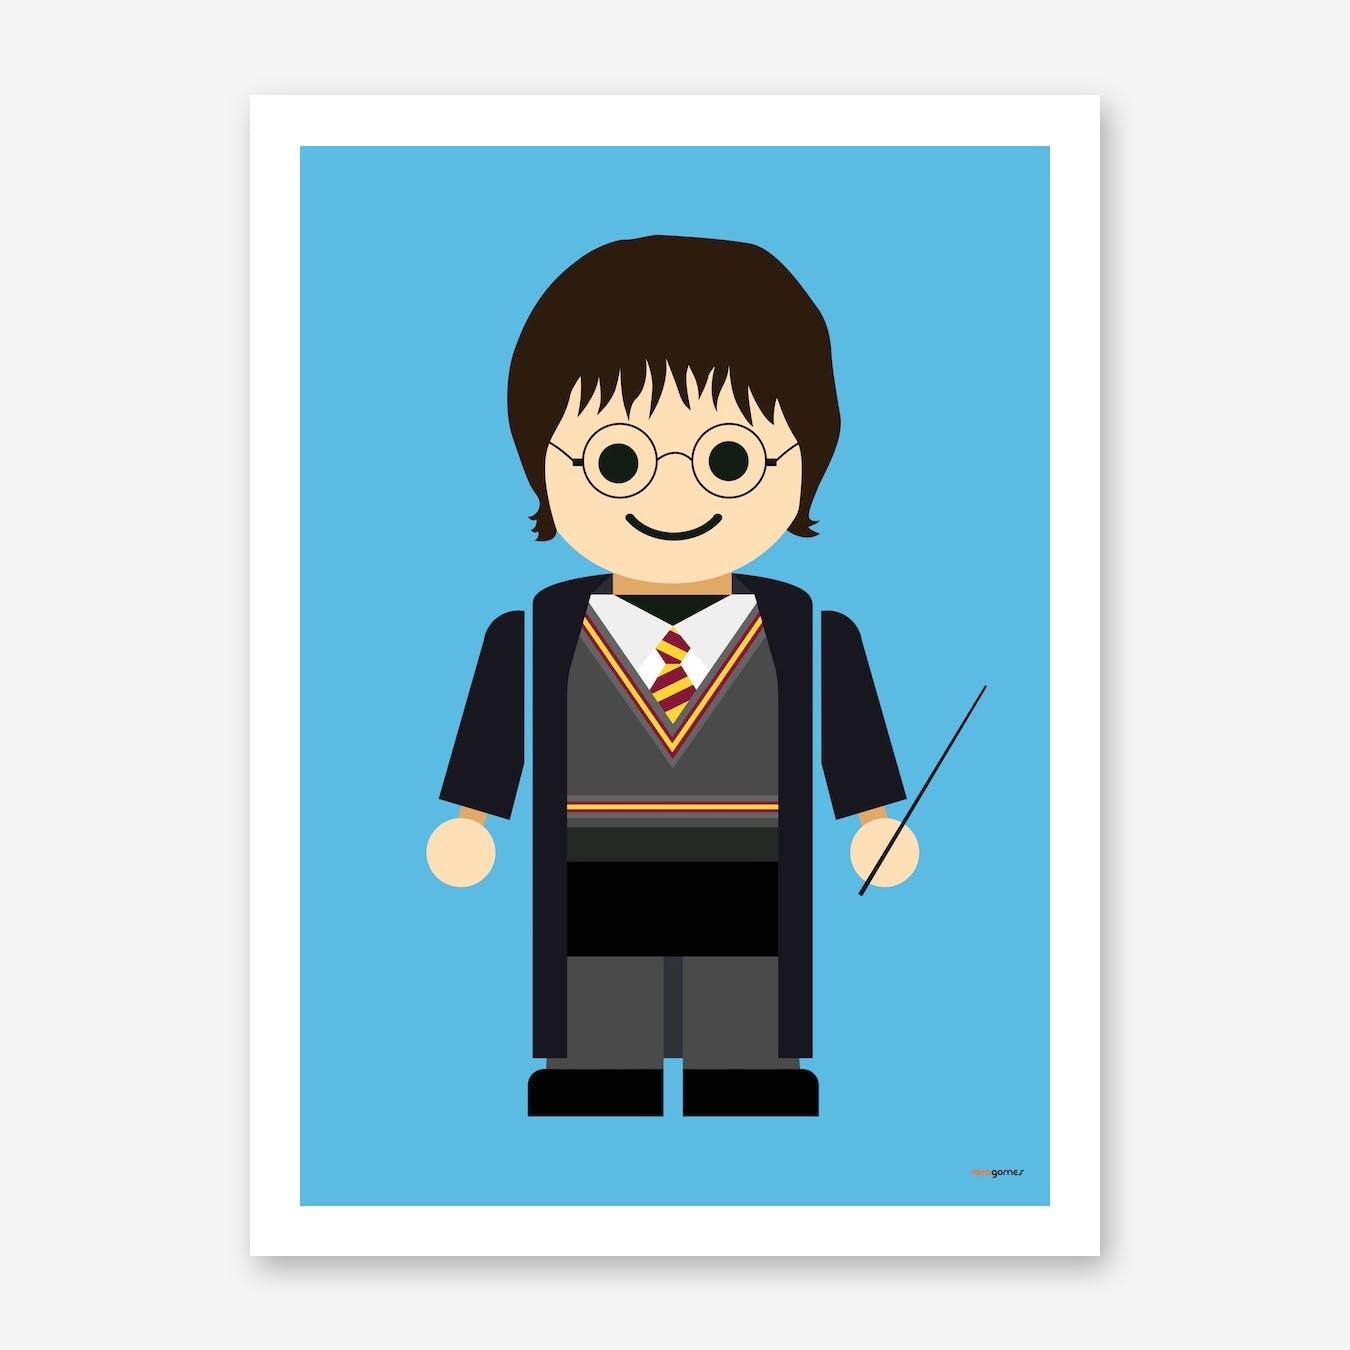 Toy Harry Potter